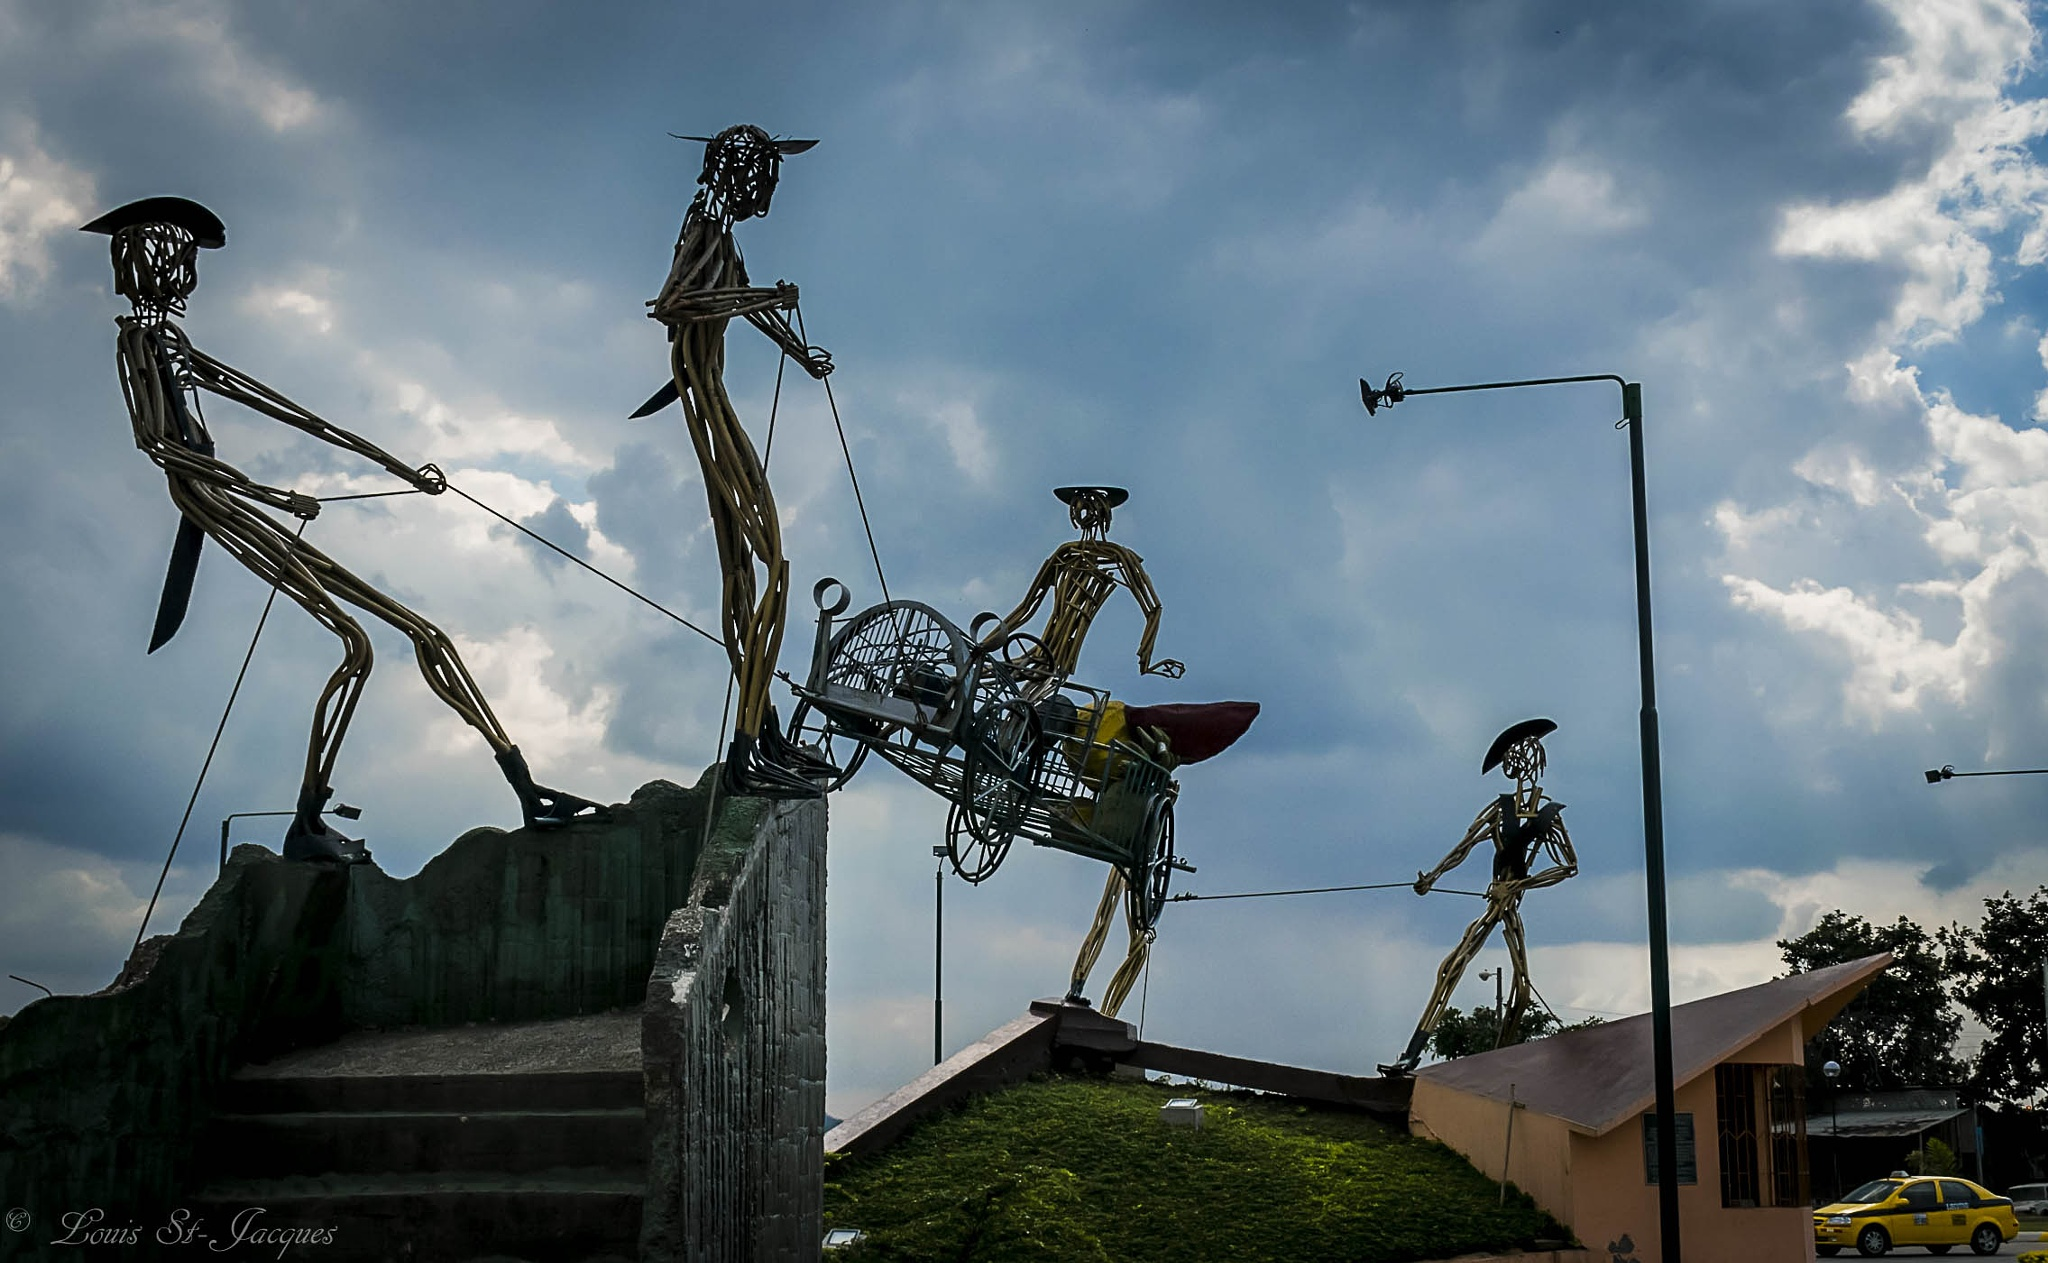 Sculpture 1 by LouisStJacques